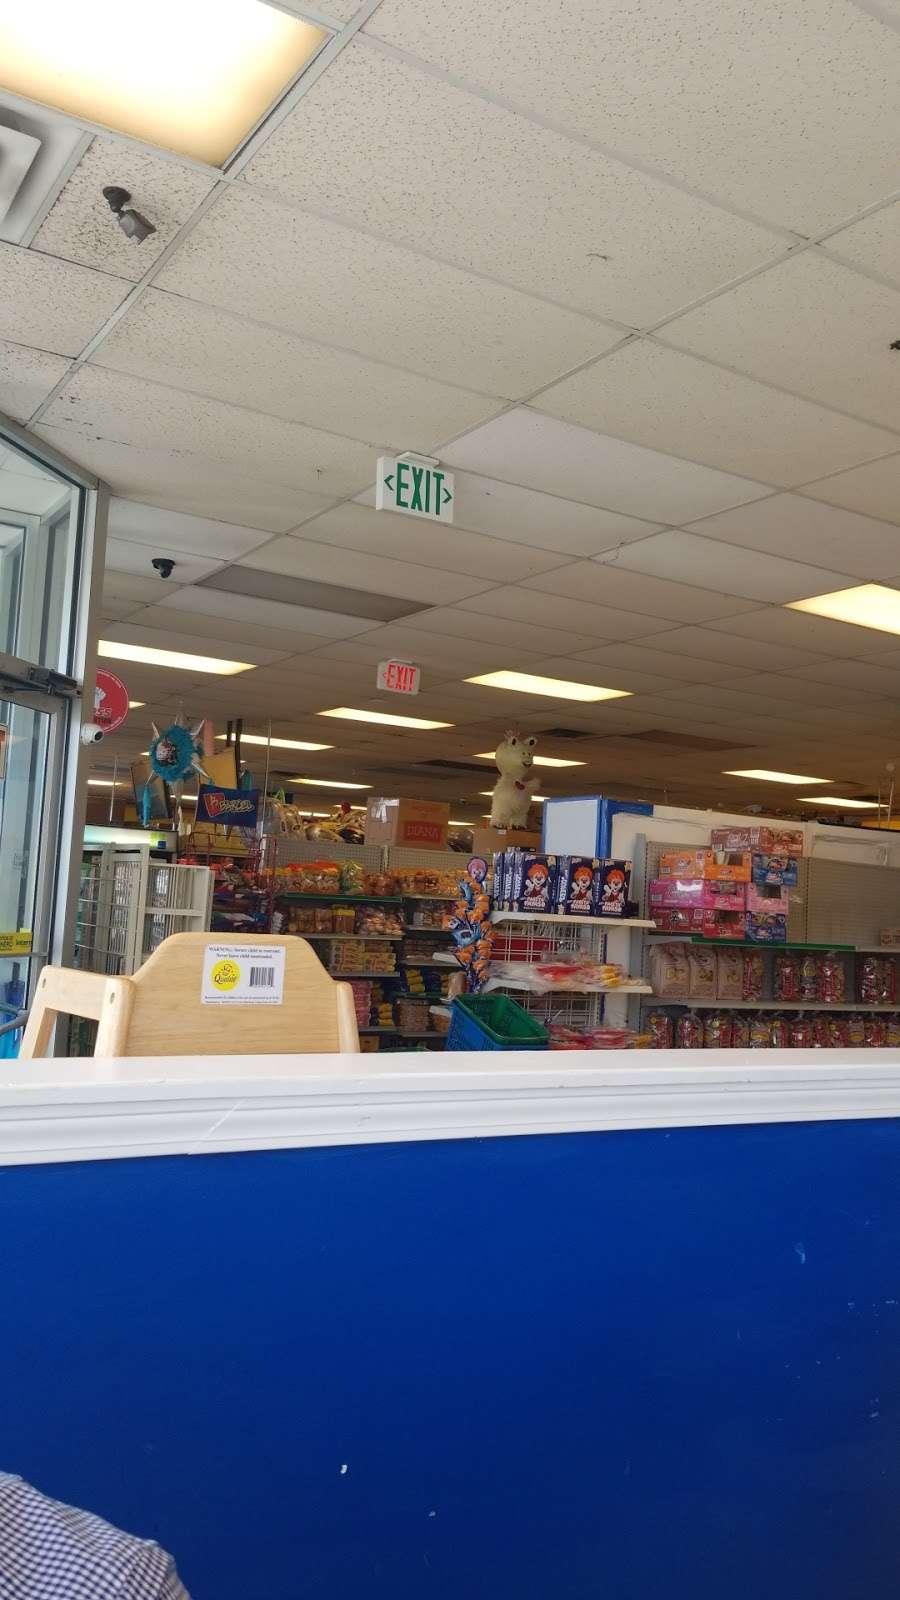 Tienda y Panaderia Guatemalteca - store    Photo 8 of 10   Address: 3709 E Washington St, Indianapolis, IN 46201, USA   Phone: (317) 353-6377